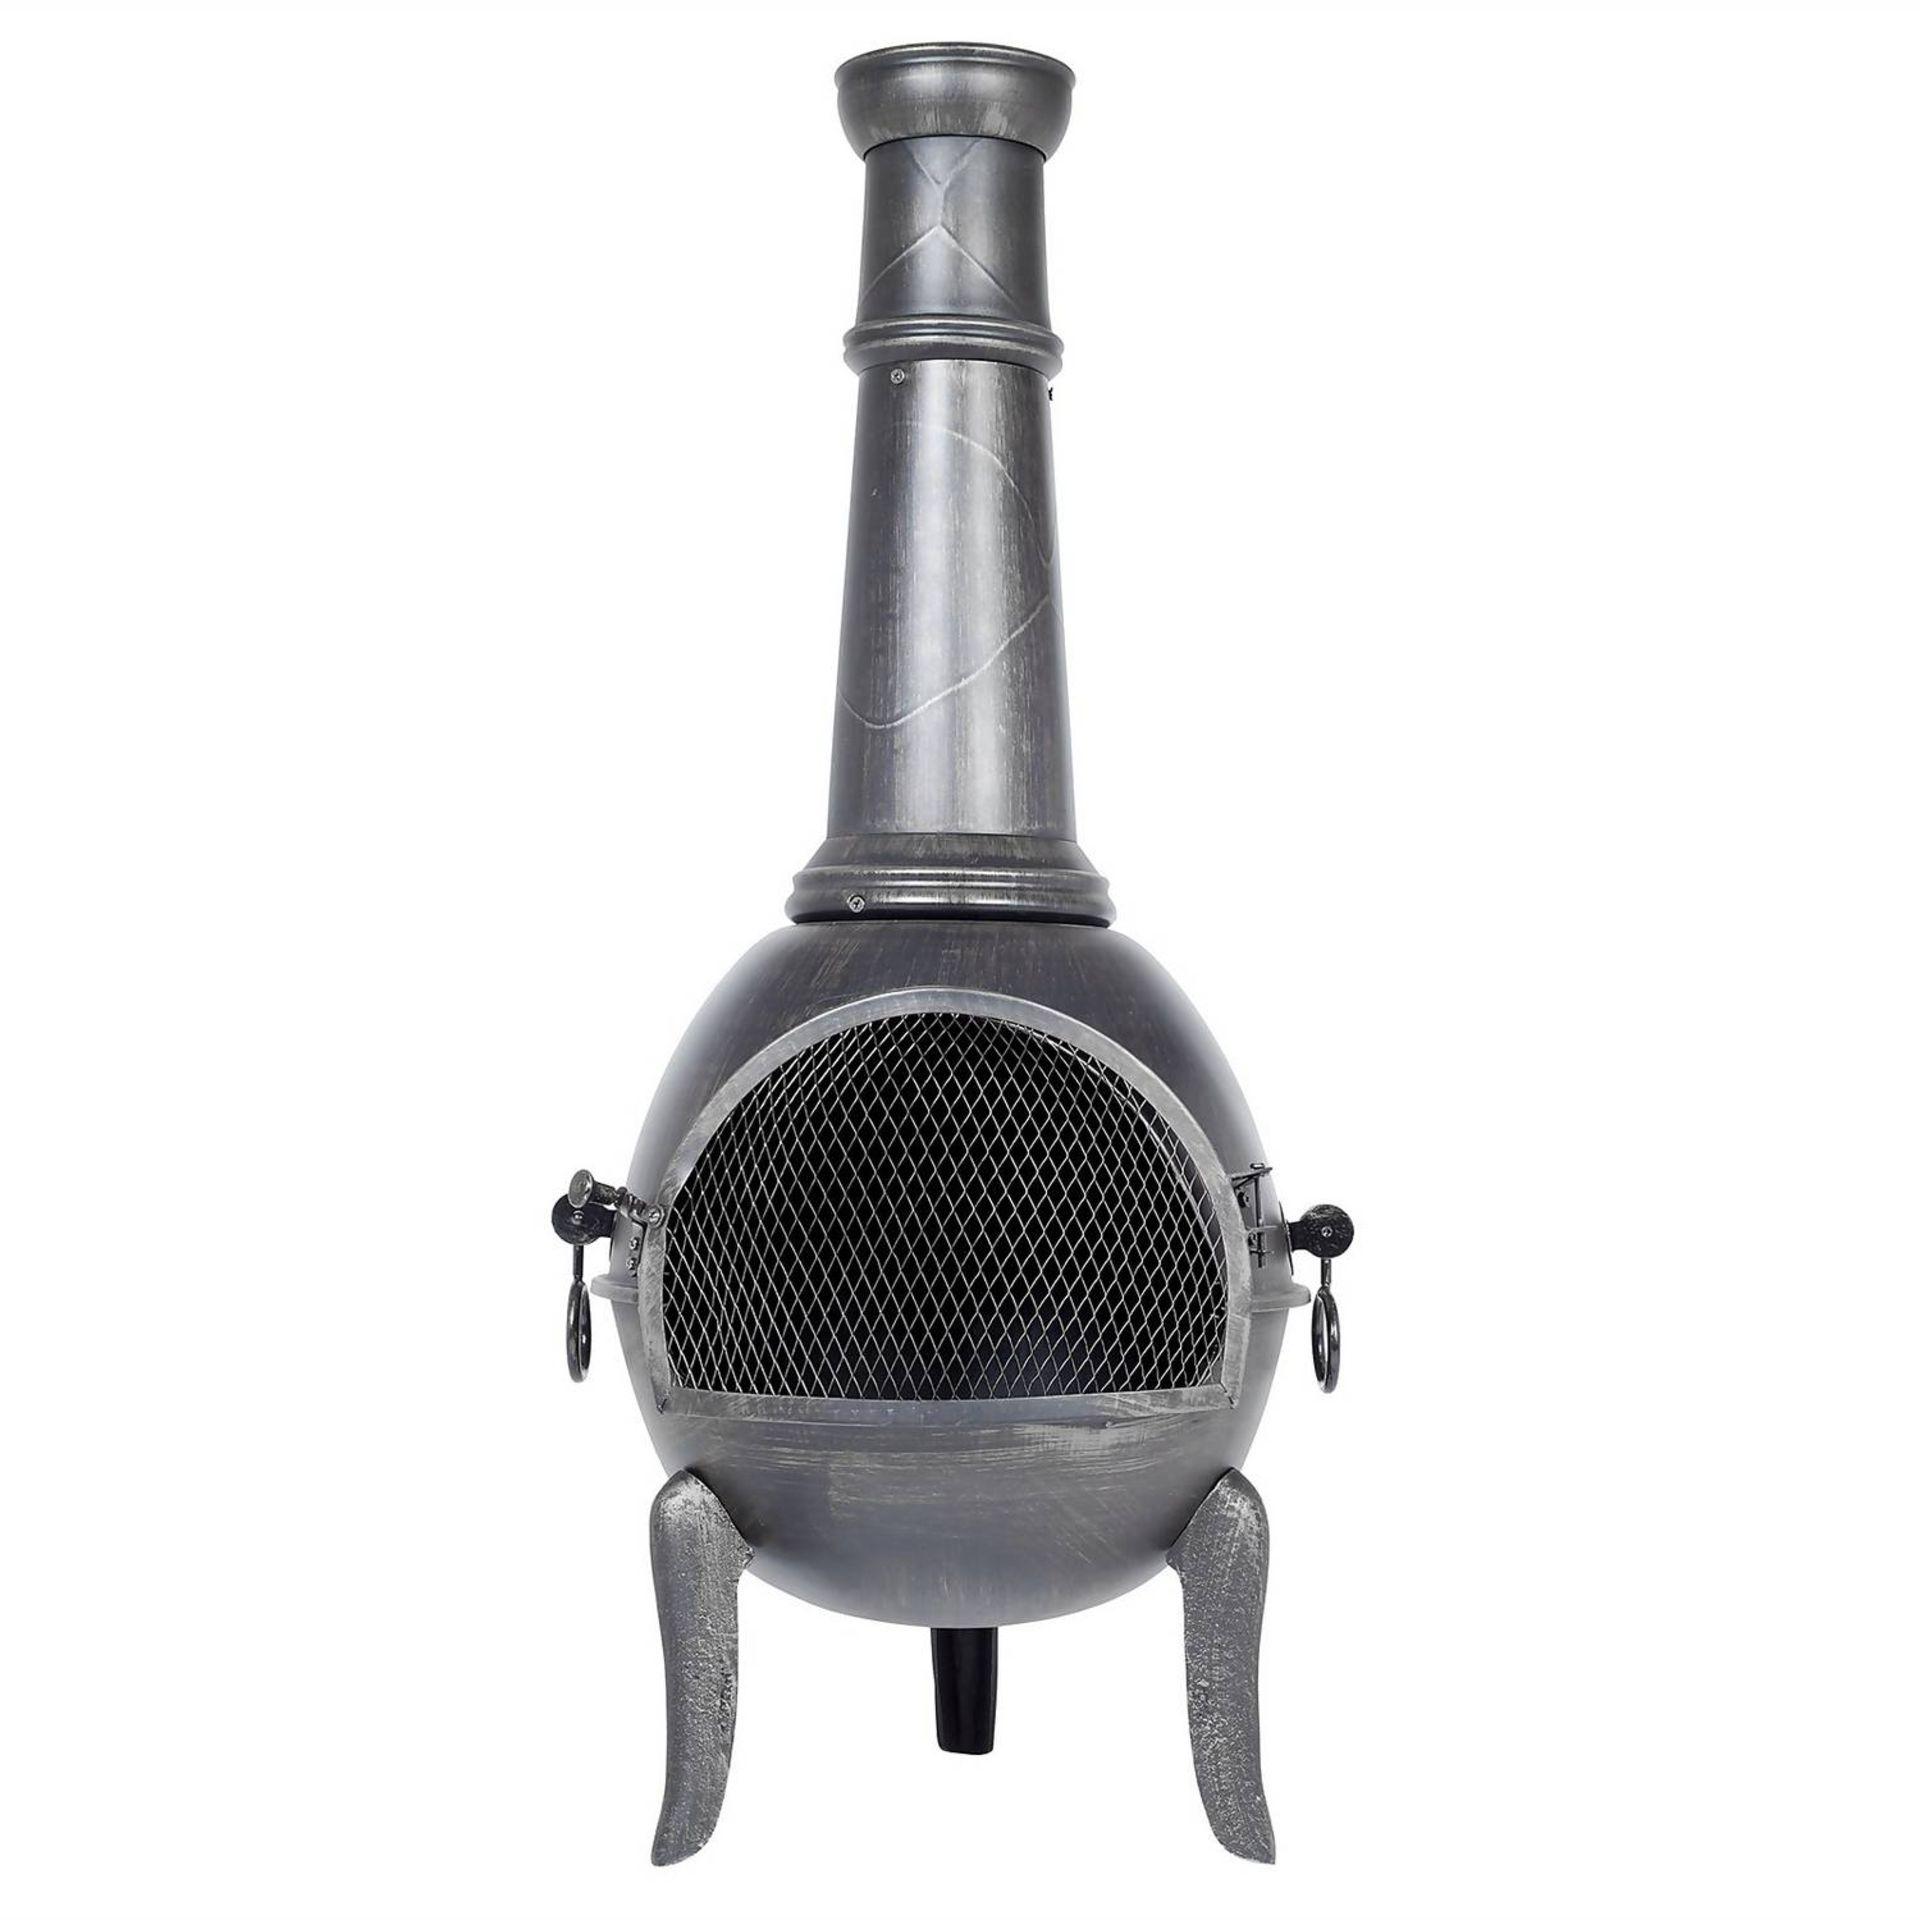 (P2) 1x La Hacienda Monterrey Steel Chimenea (H123cm x D50cm)